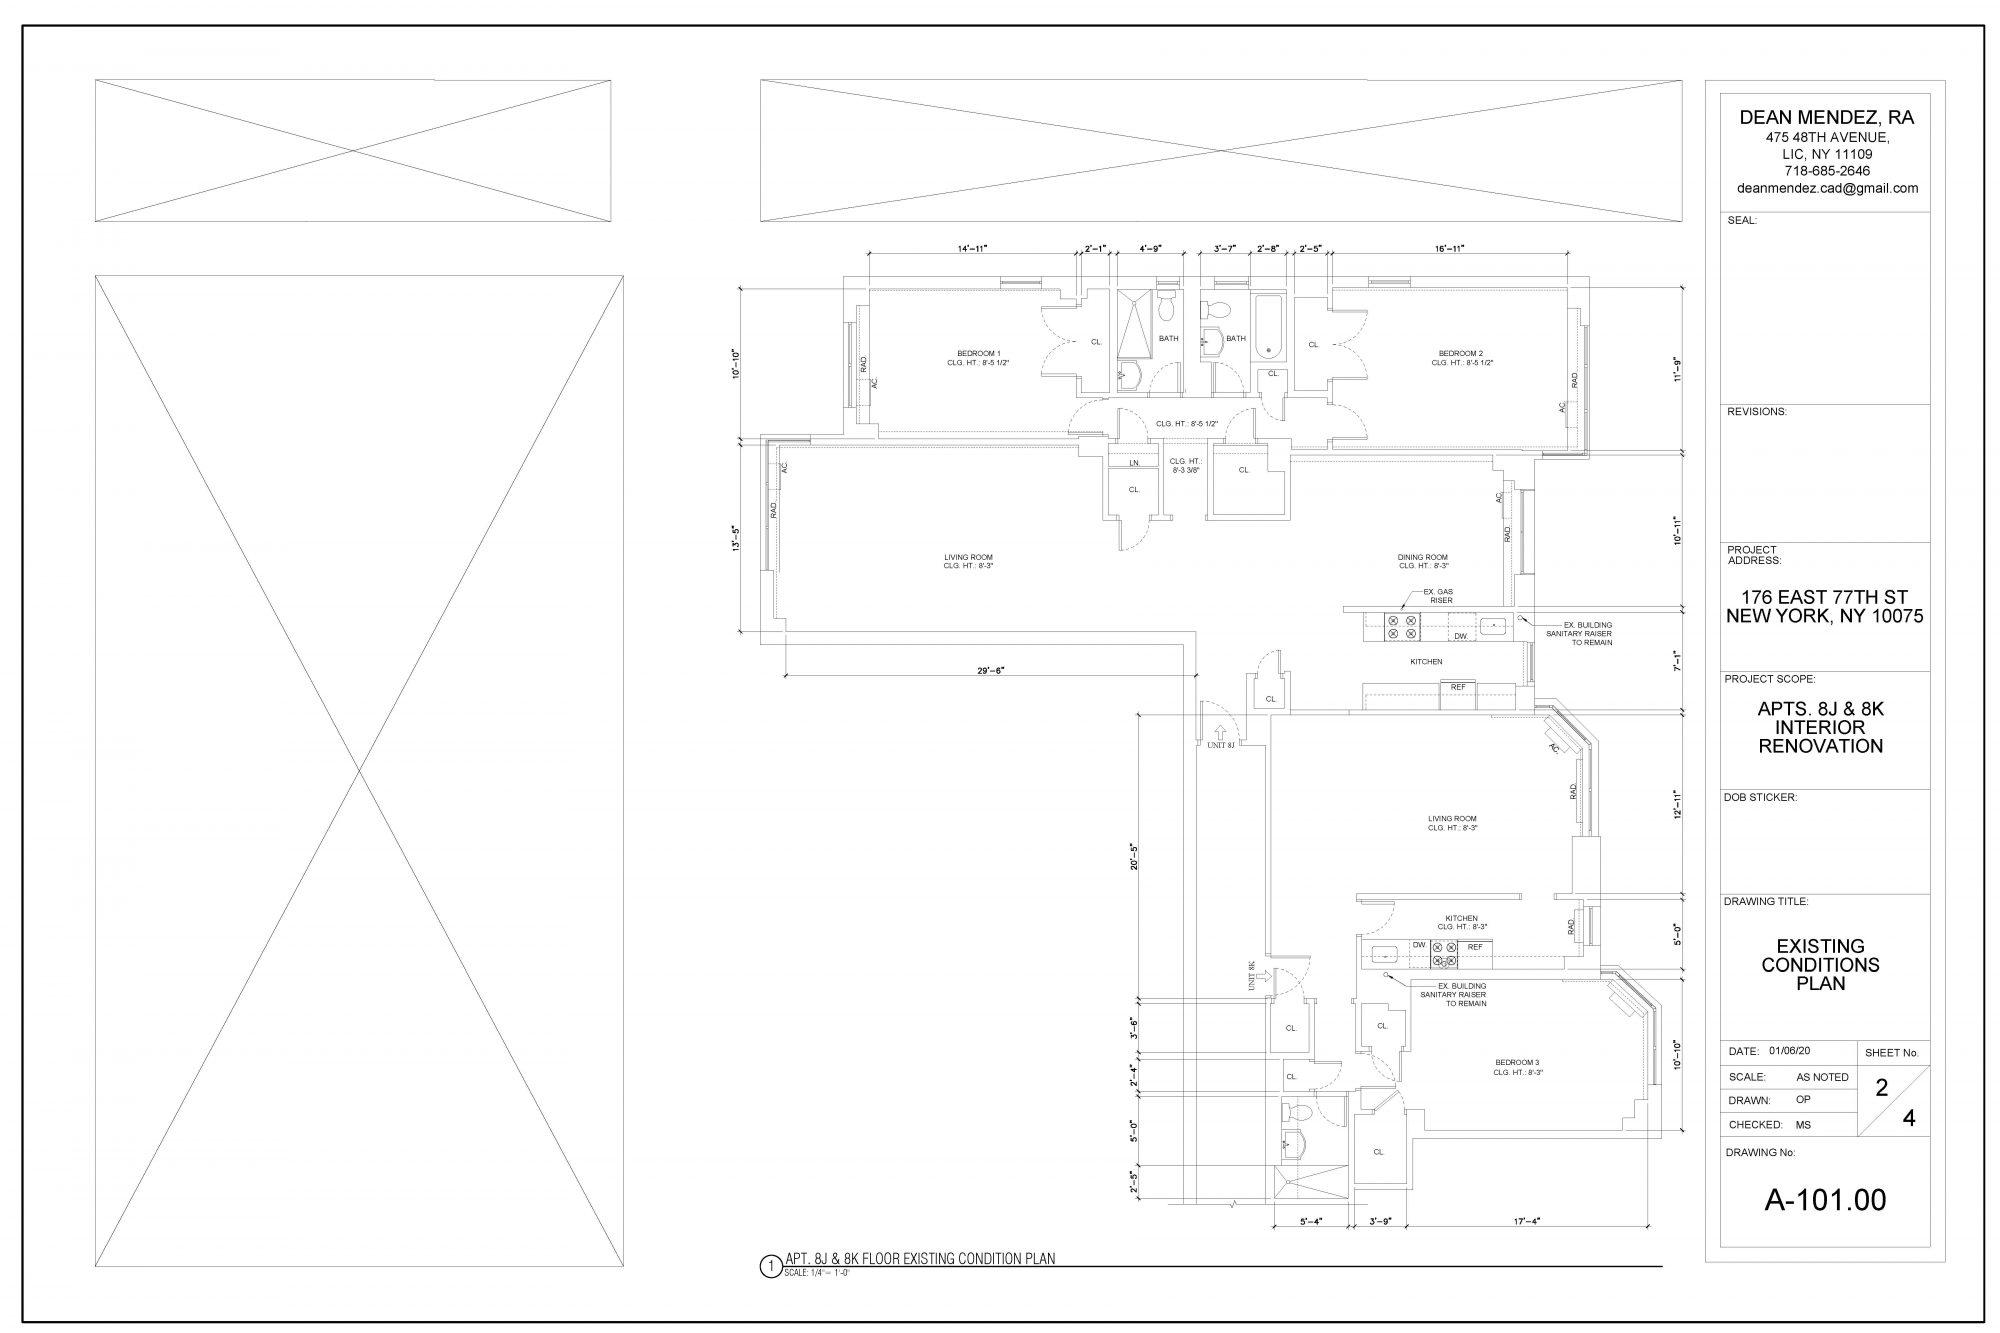 Renovation Construction Drawing